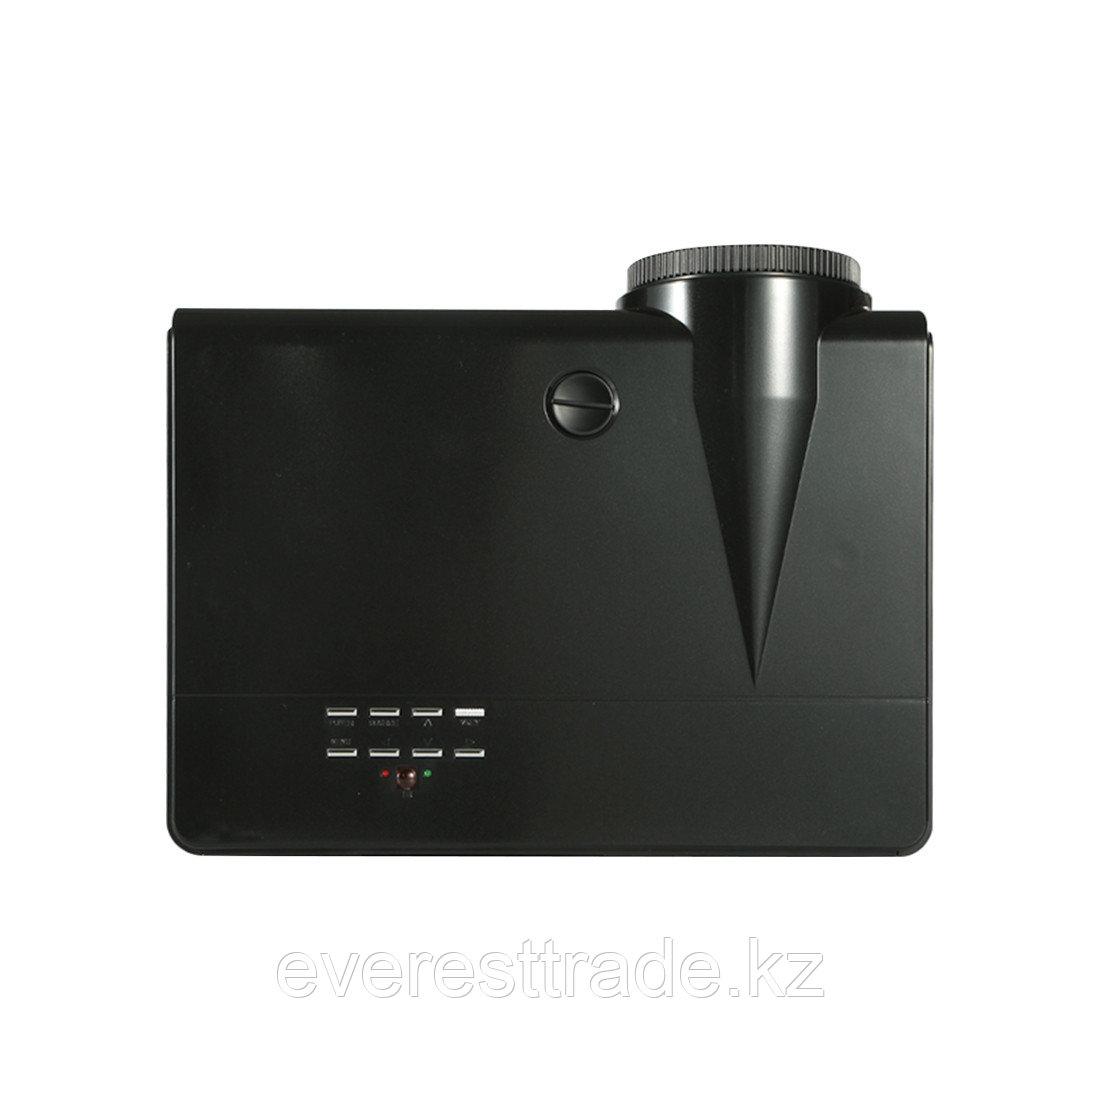 Проектор BYINTEK BT96 Plus